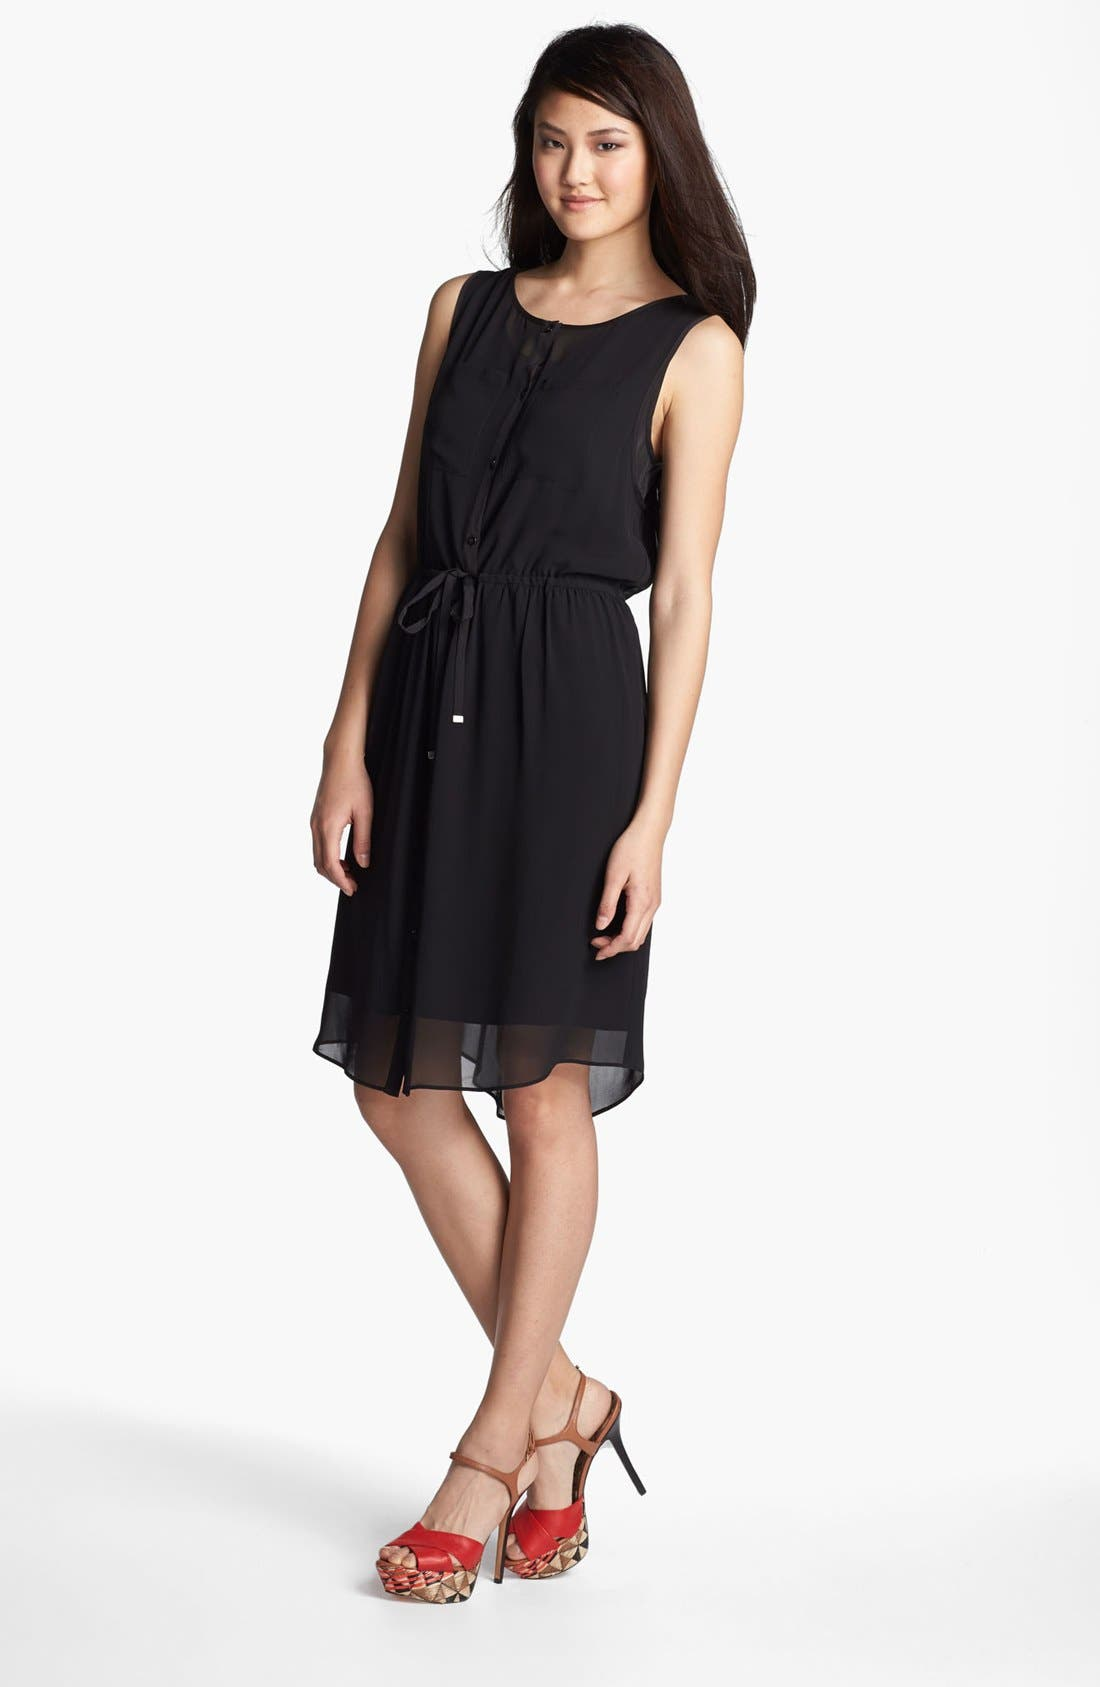 Main Image - Kenneth Cole New York 'Amy' Sleeveless Drawstring  Dress